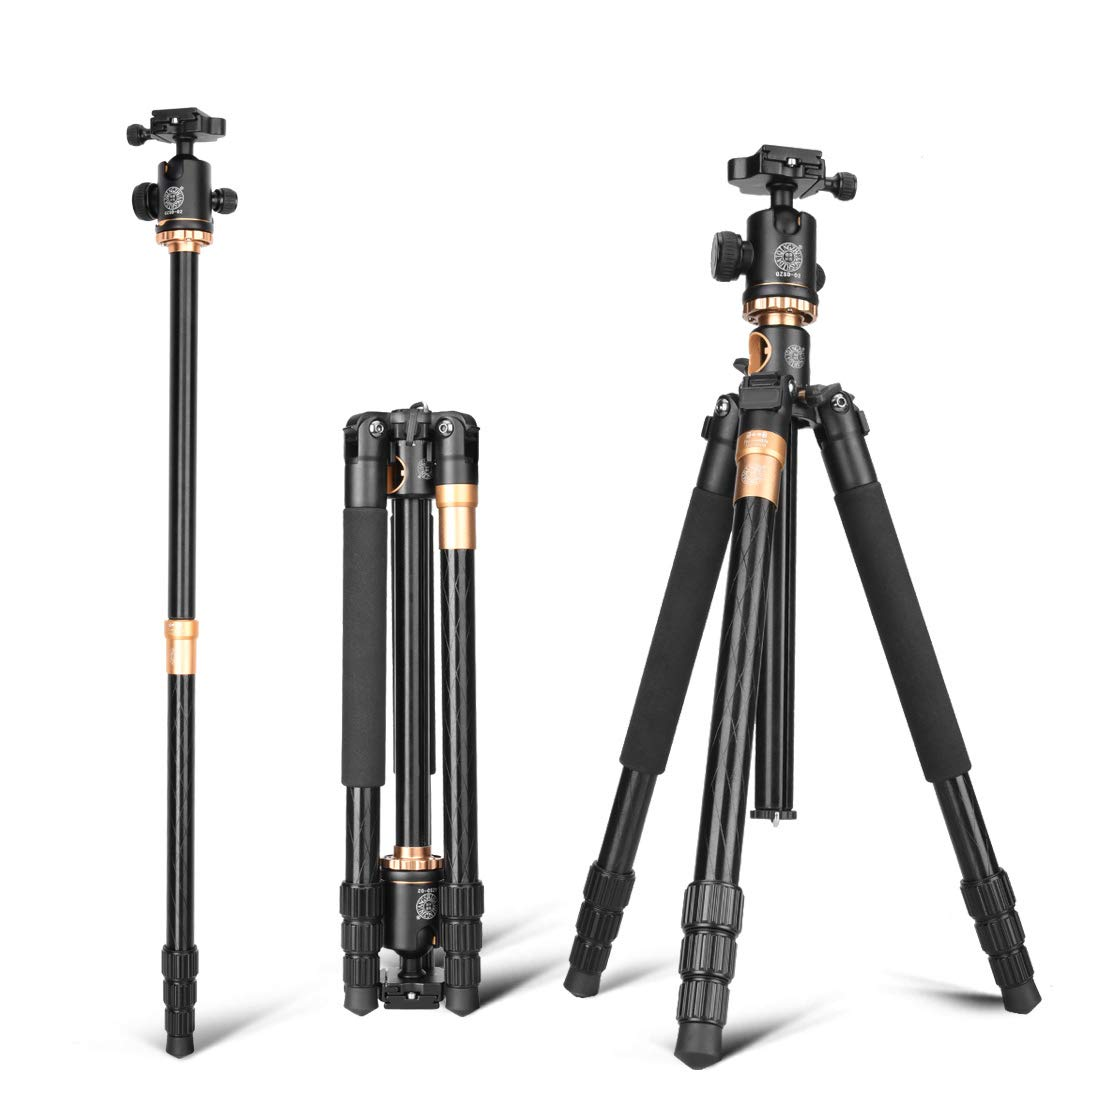 DSLR三脚360度パノラマボールヘッド付き軽量コンパクトアルミニウム製カメラ三脚クイックリリースプレートロード5KGトラベル&ワーク(ブラック)   B07QZ3YW43